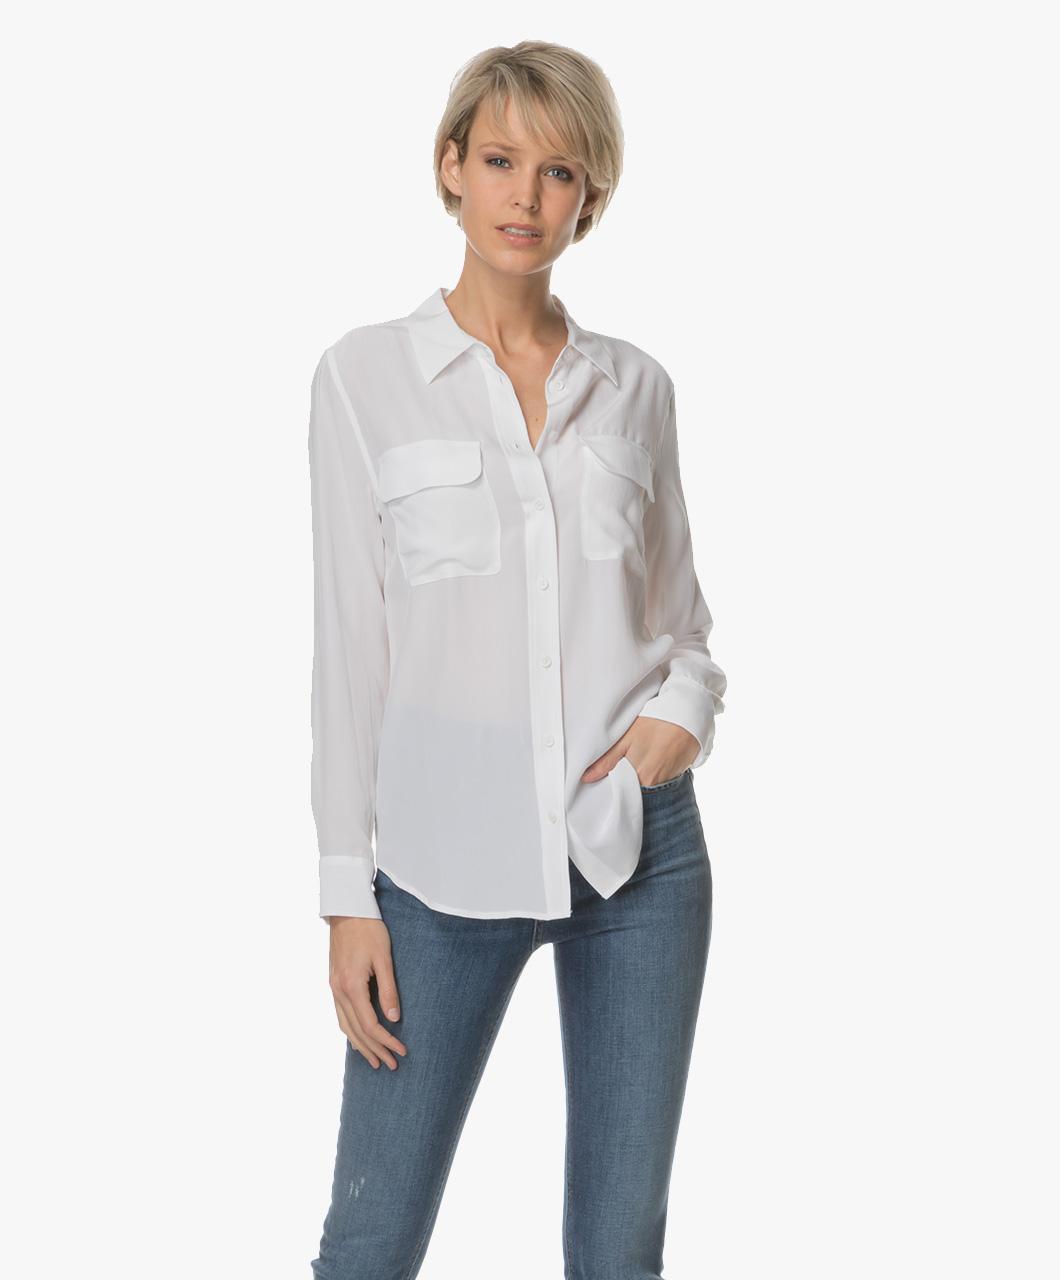 9345a5e546bdc3 Equipment Slim Signature Washed-silk Shirt - Bright White - Equipment